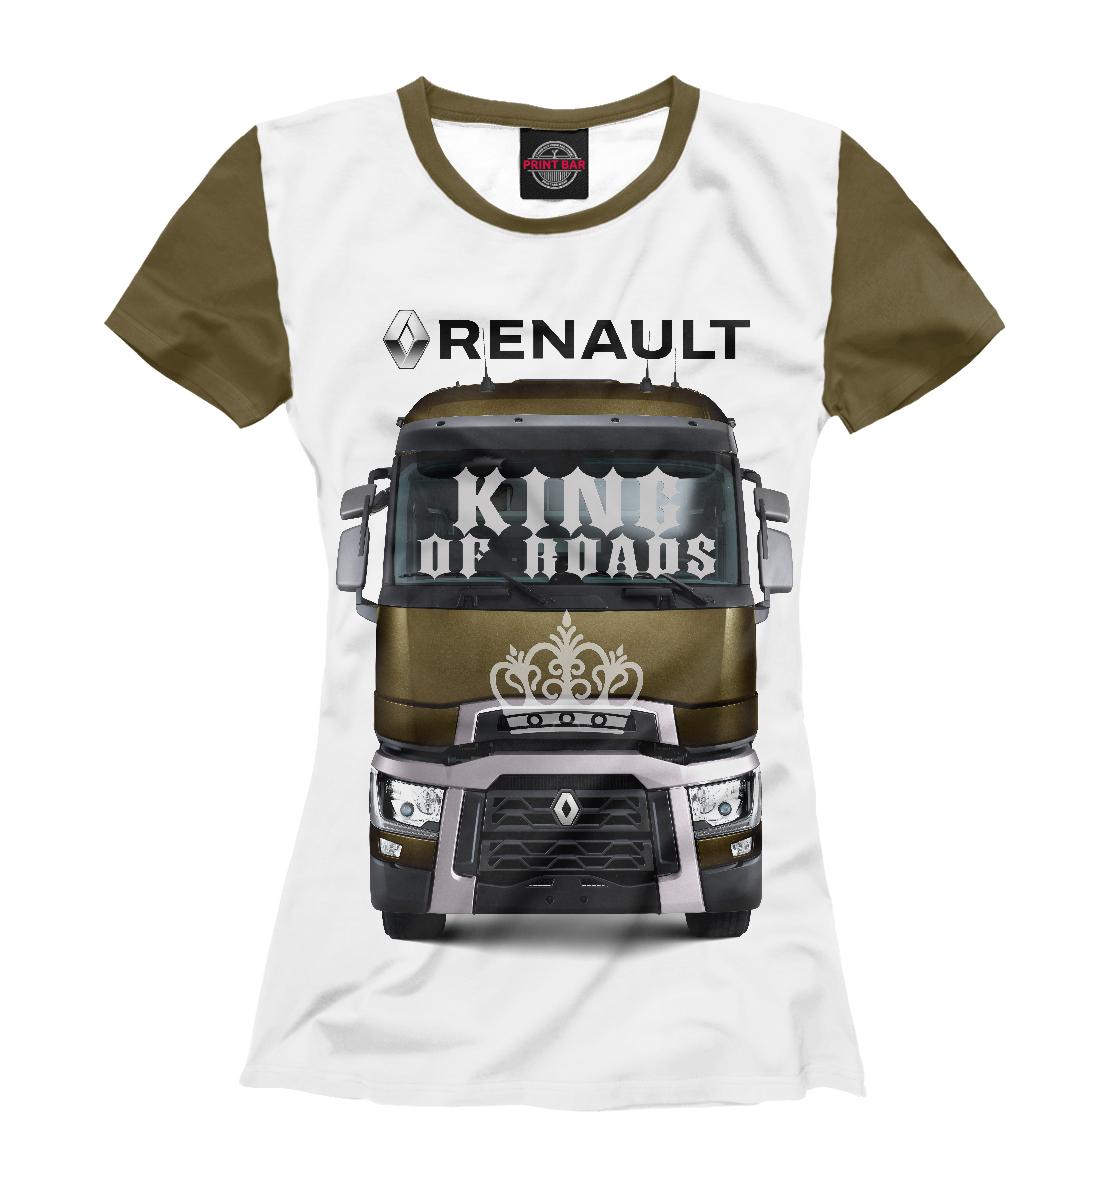 Купить RENAULT - король дорог, Printbar, Футболки, GRZ-918078-fut-1